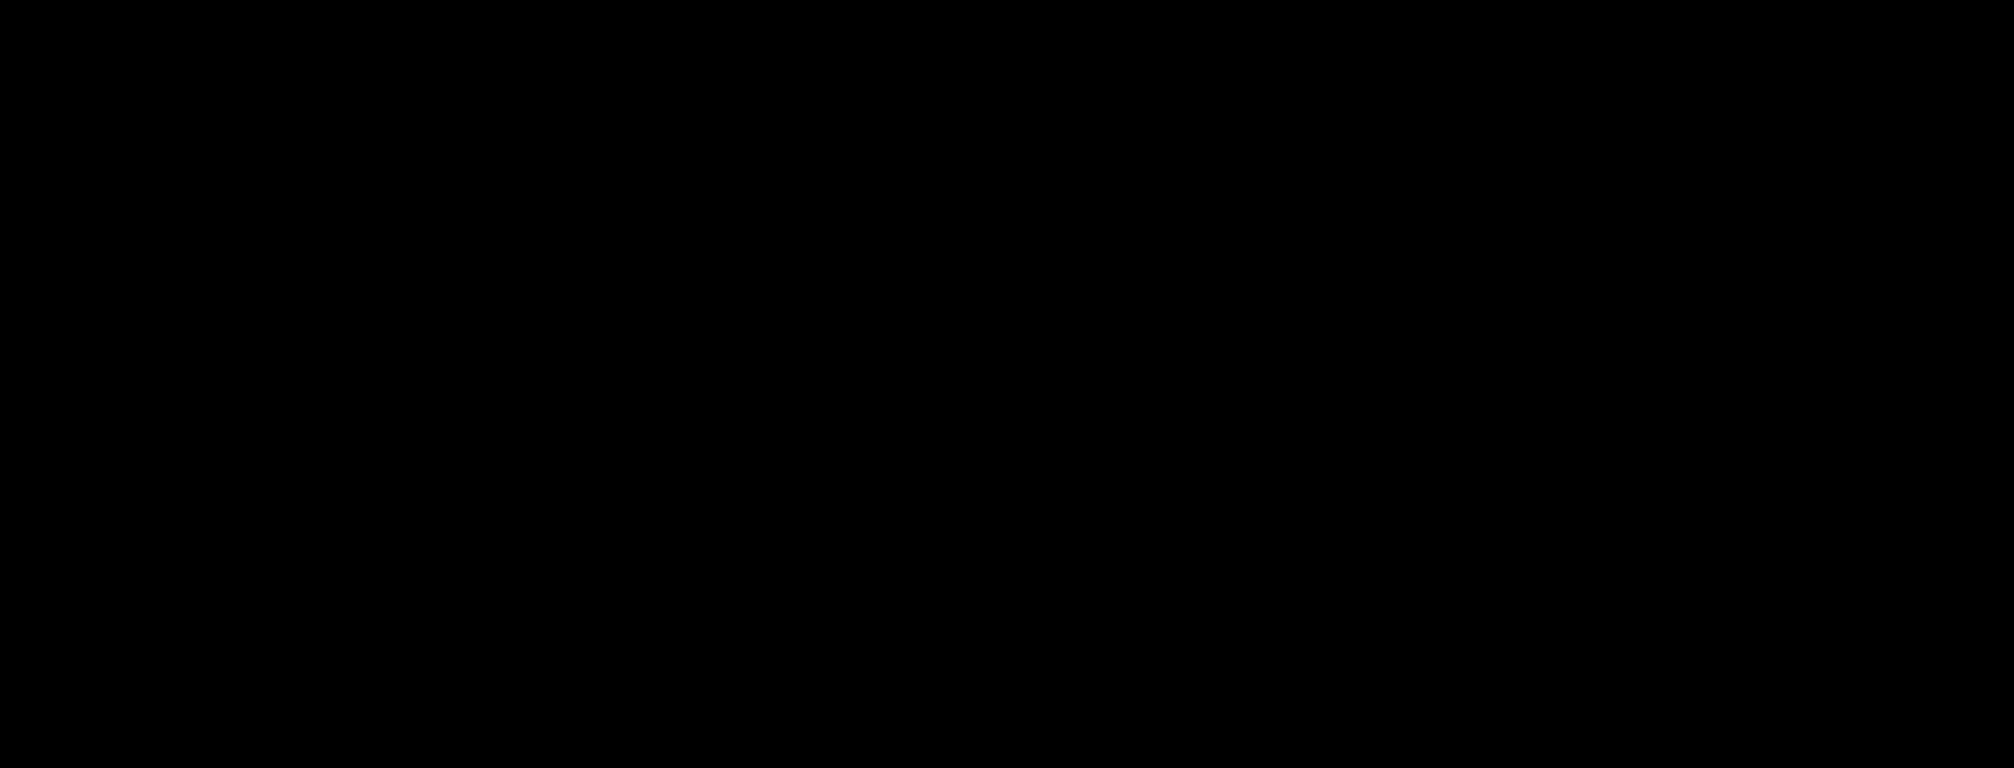 Fmoc-Lys(Mca)-OH